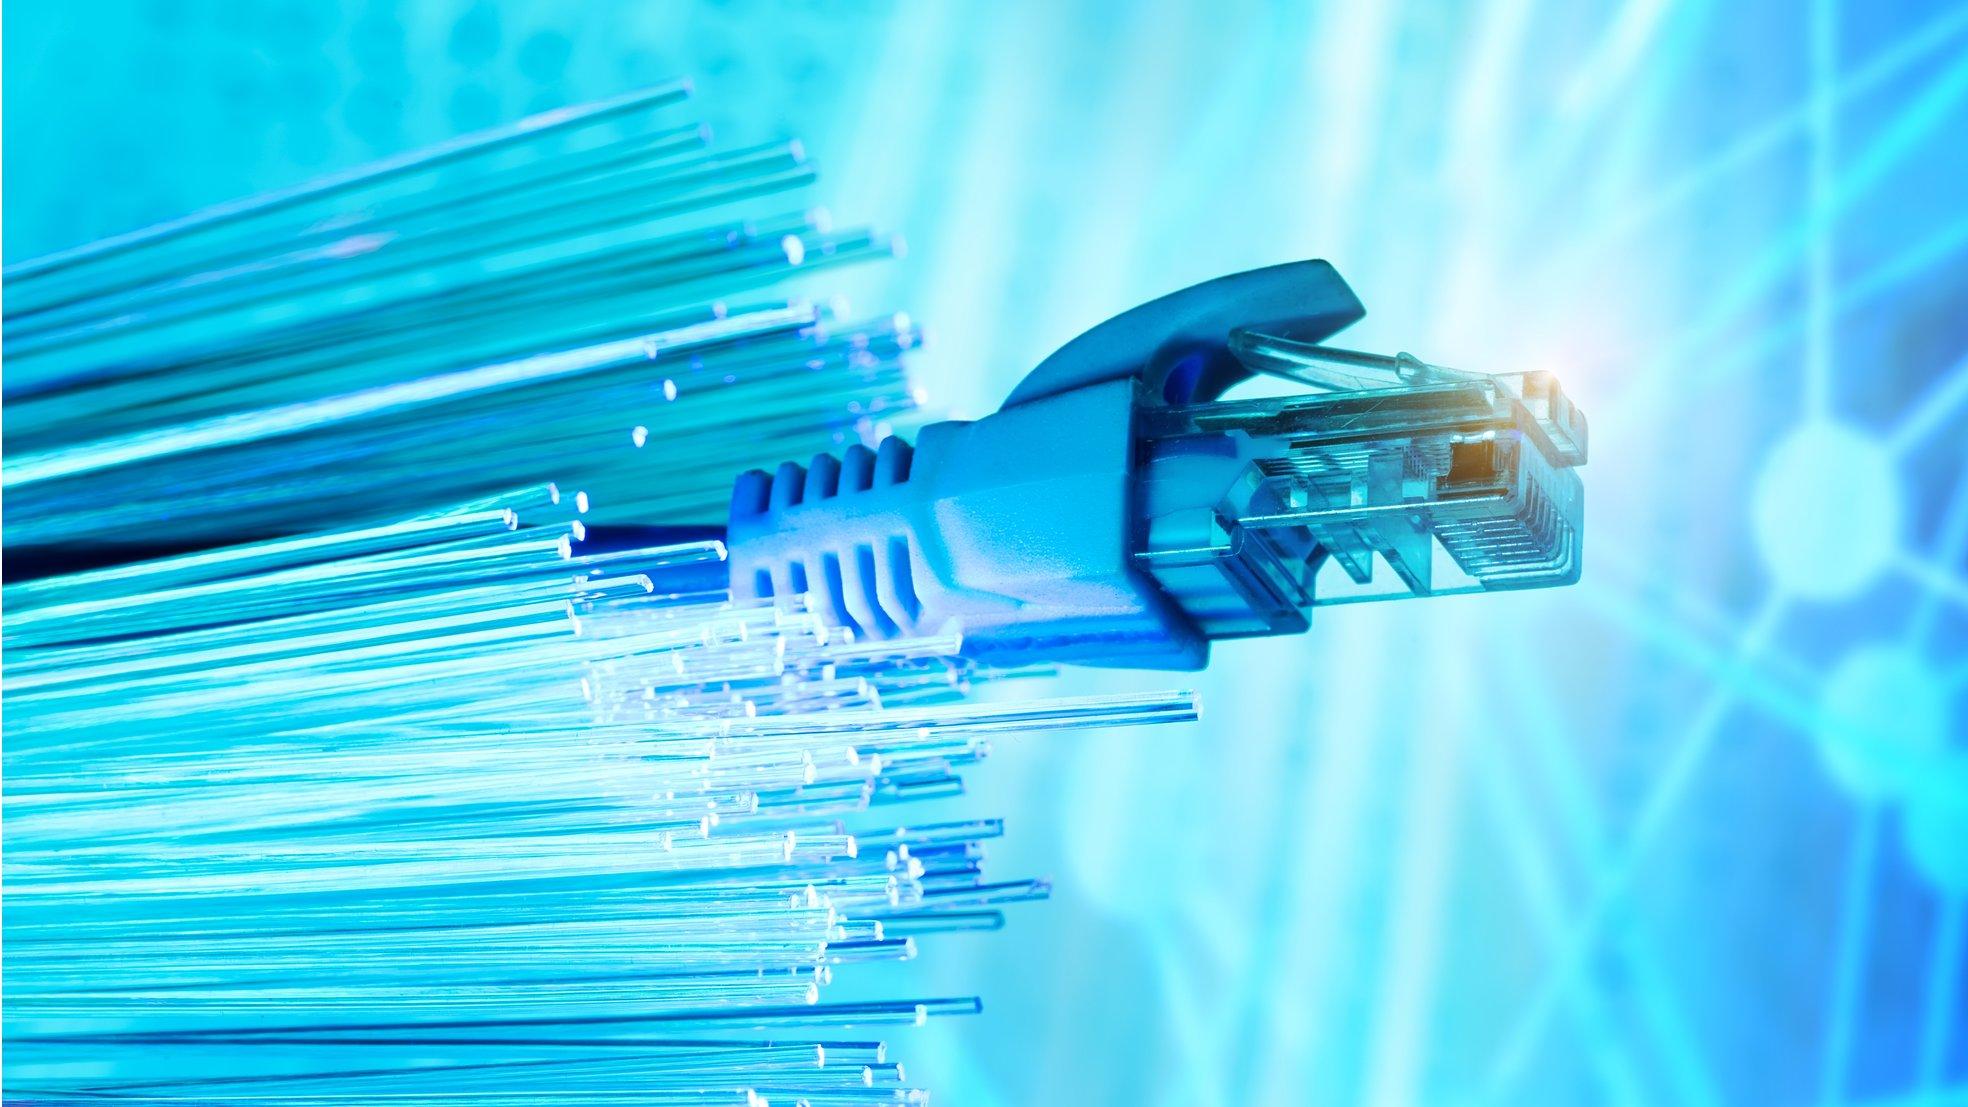 Swiss beat UK's BT to next-gen G.fast broadband